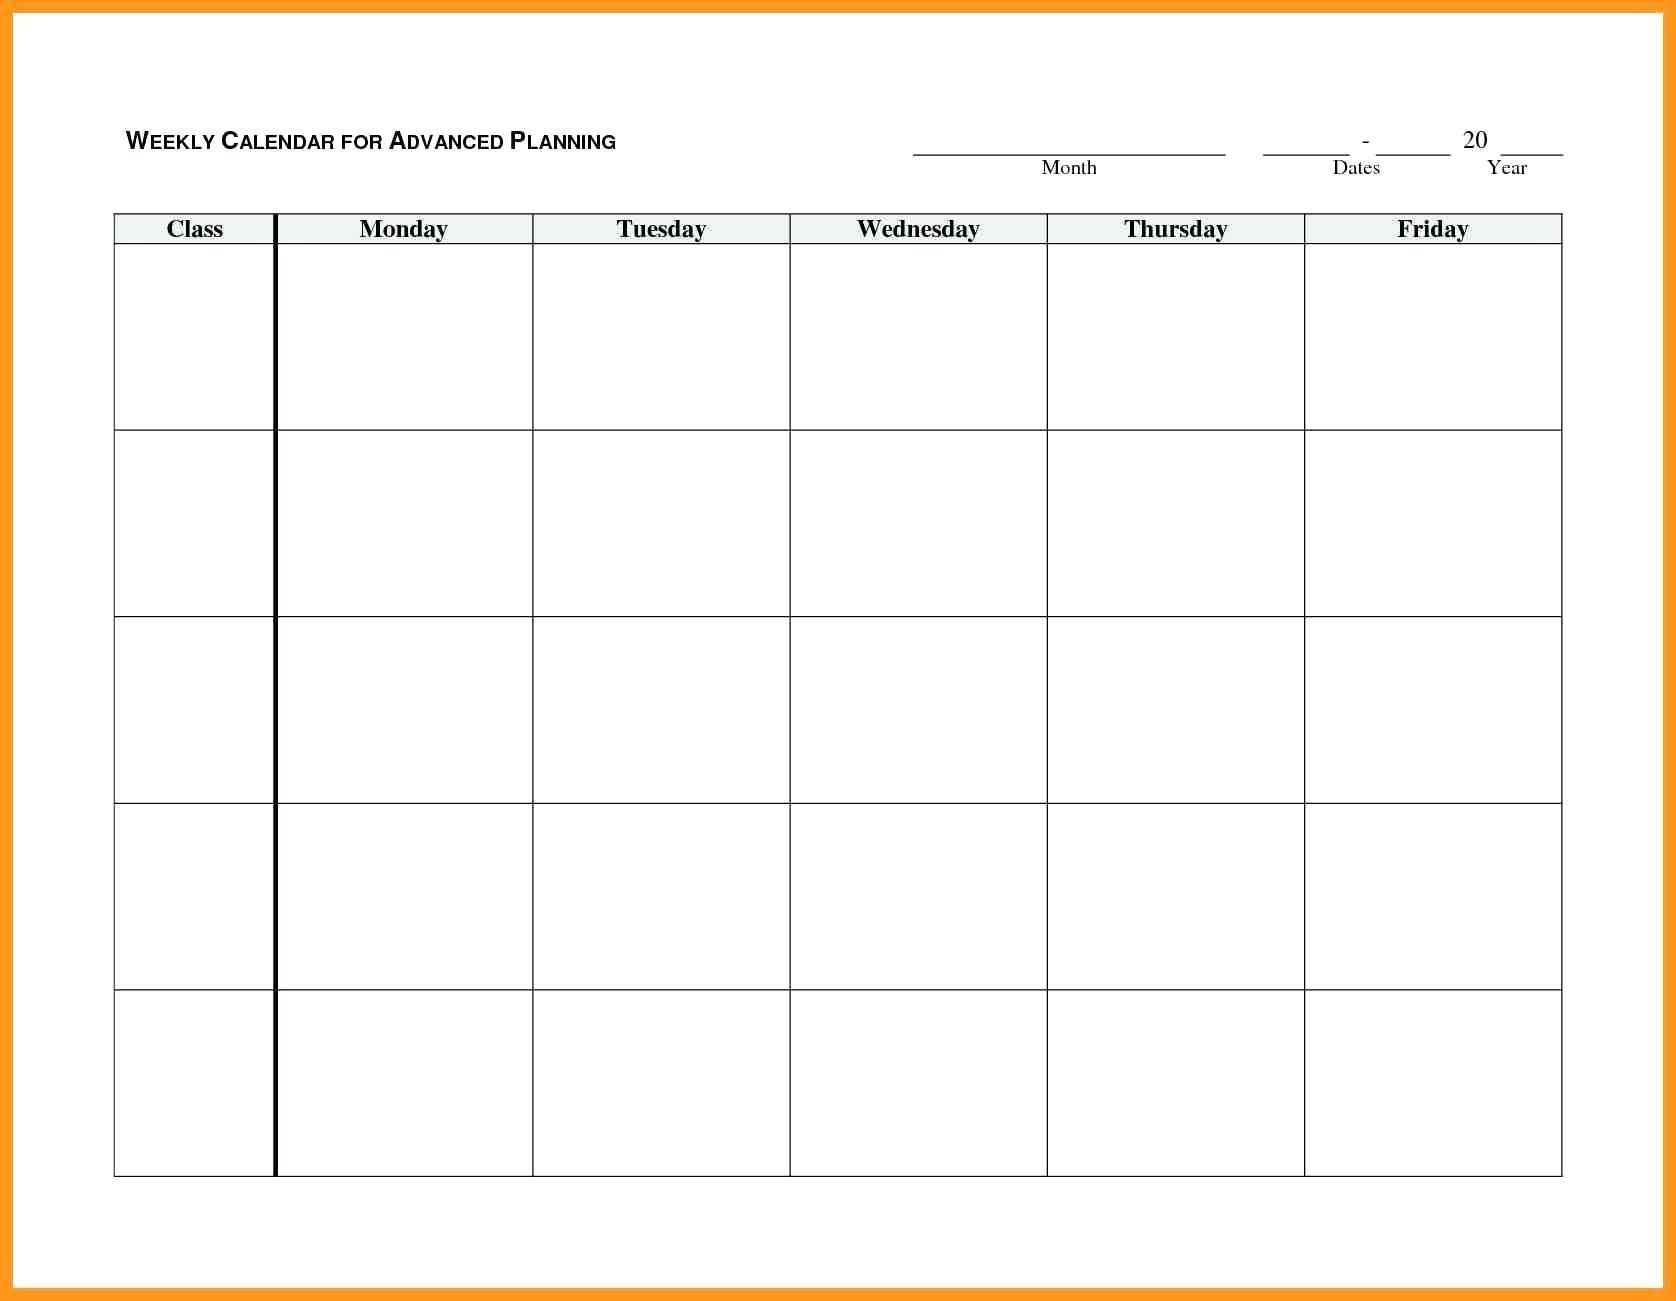 Blank Weekly Ndar Monday Through Friday Template Word Free Printable regarding Monday Through Friday Blank Calendar Printable